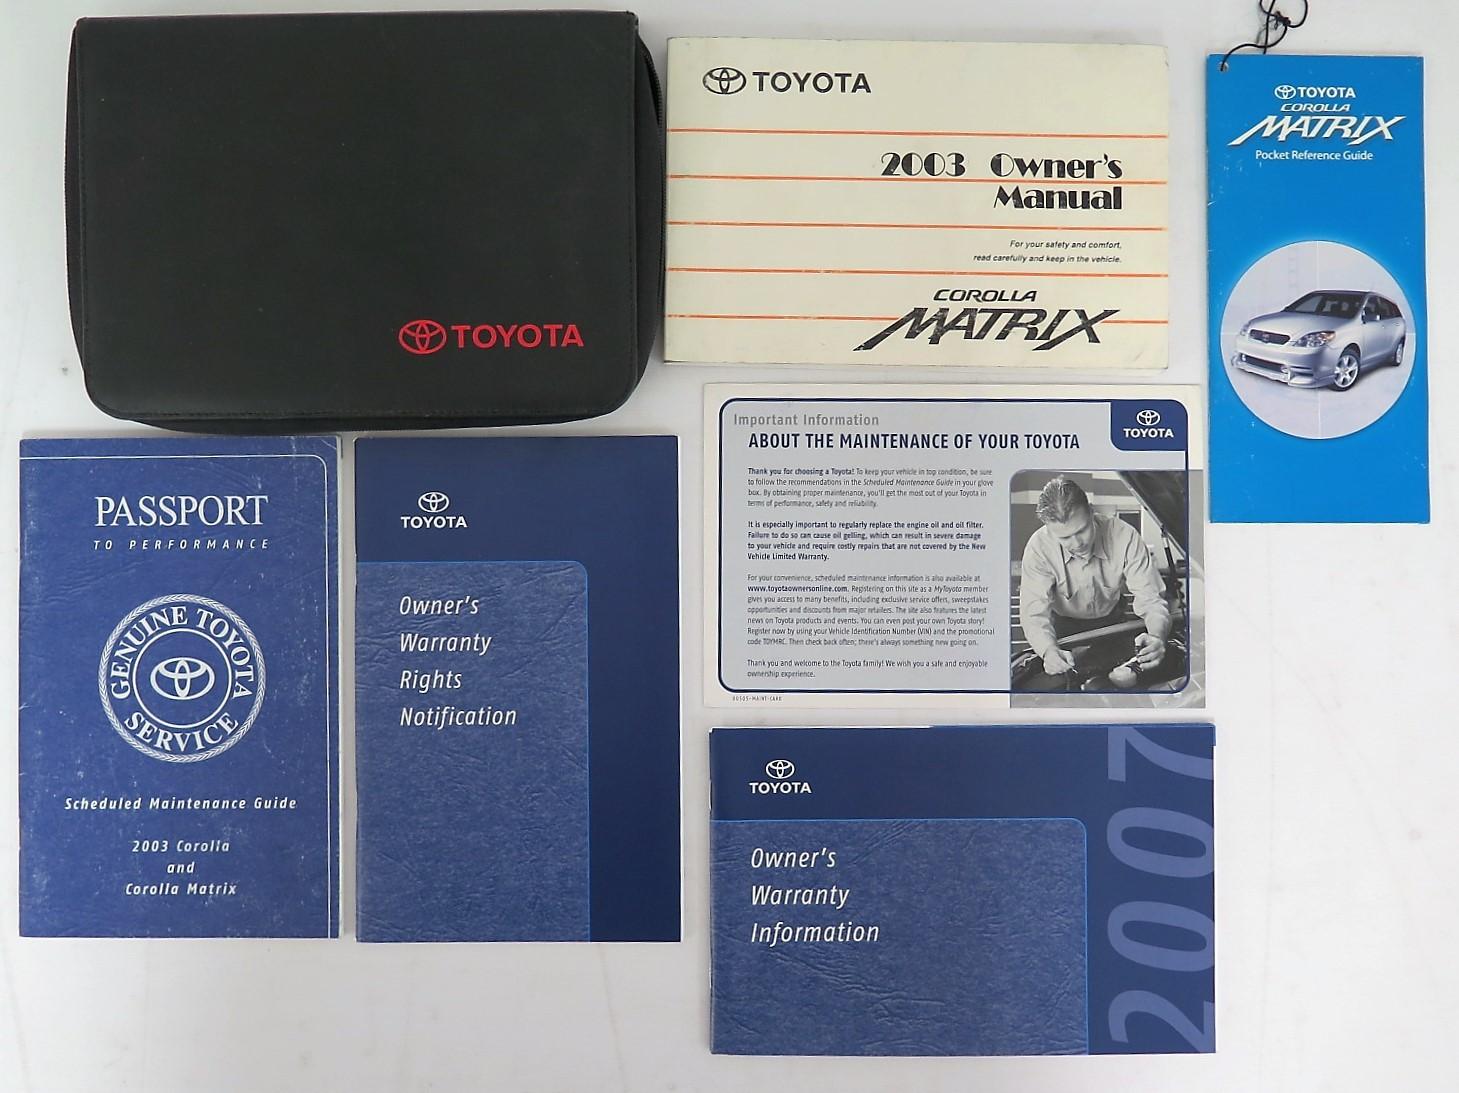 2003 toyota corolla matrix owners manual book bashful yak rh bashfulyak com 2003 Toyota Matrix Short Shifter 2003 Toyota Matrix Short Shifter